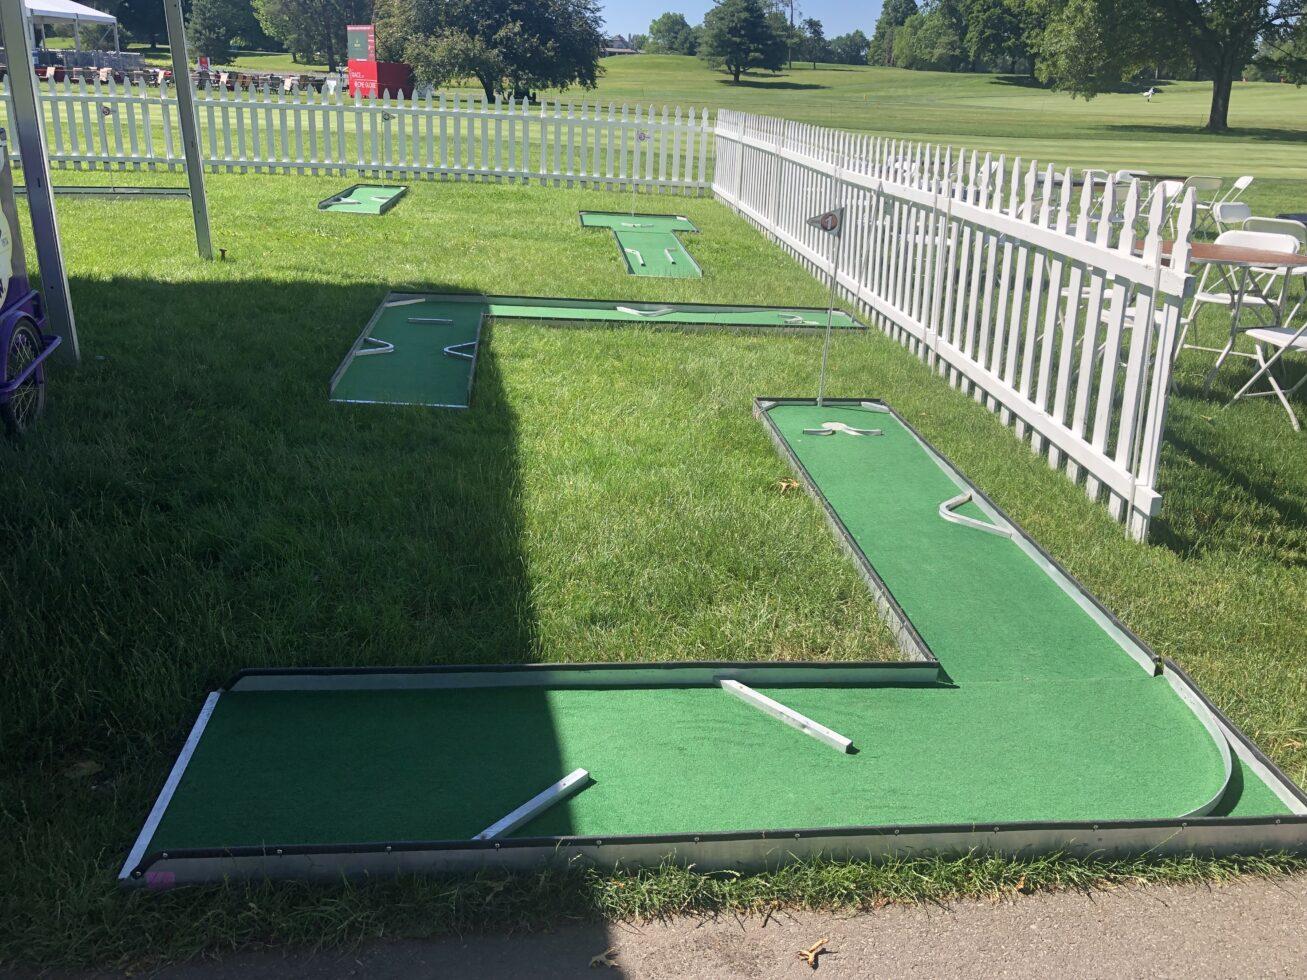 Event mini golf course